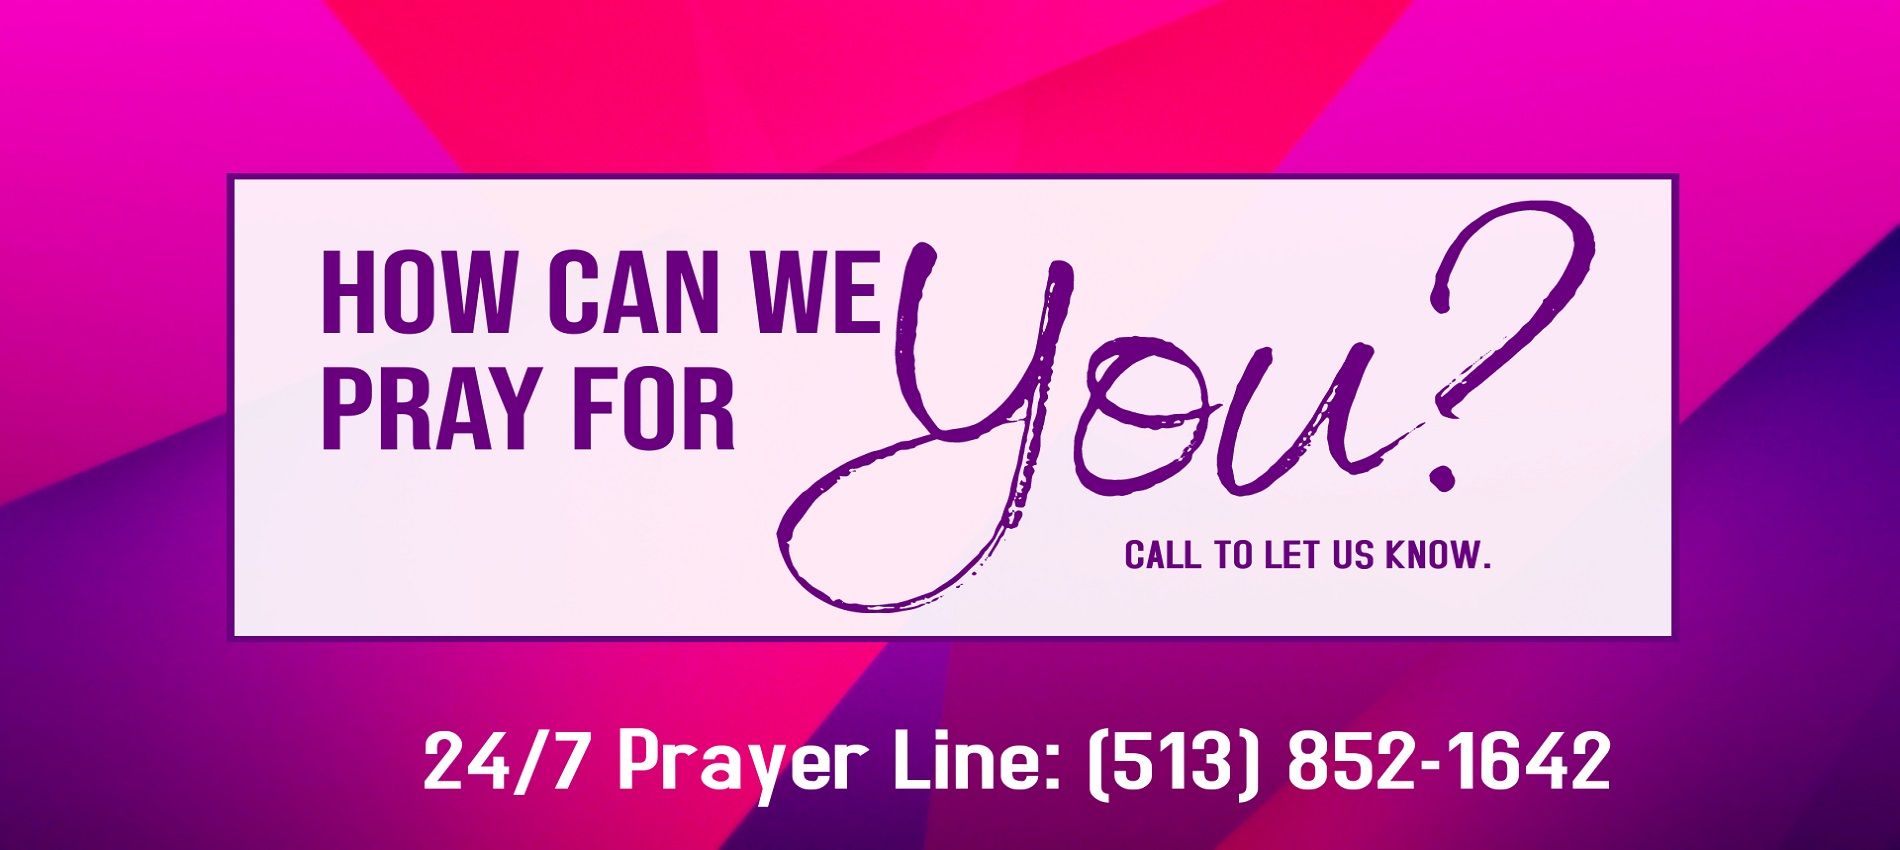 Prayer Line Banner